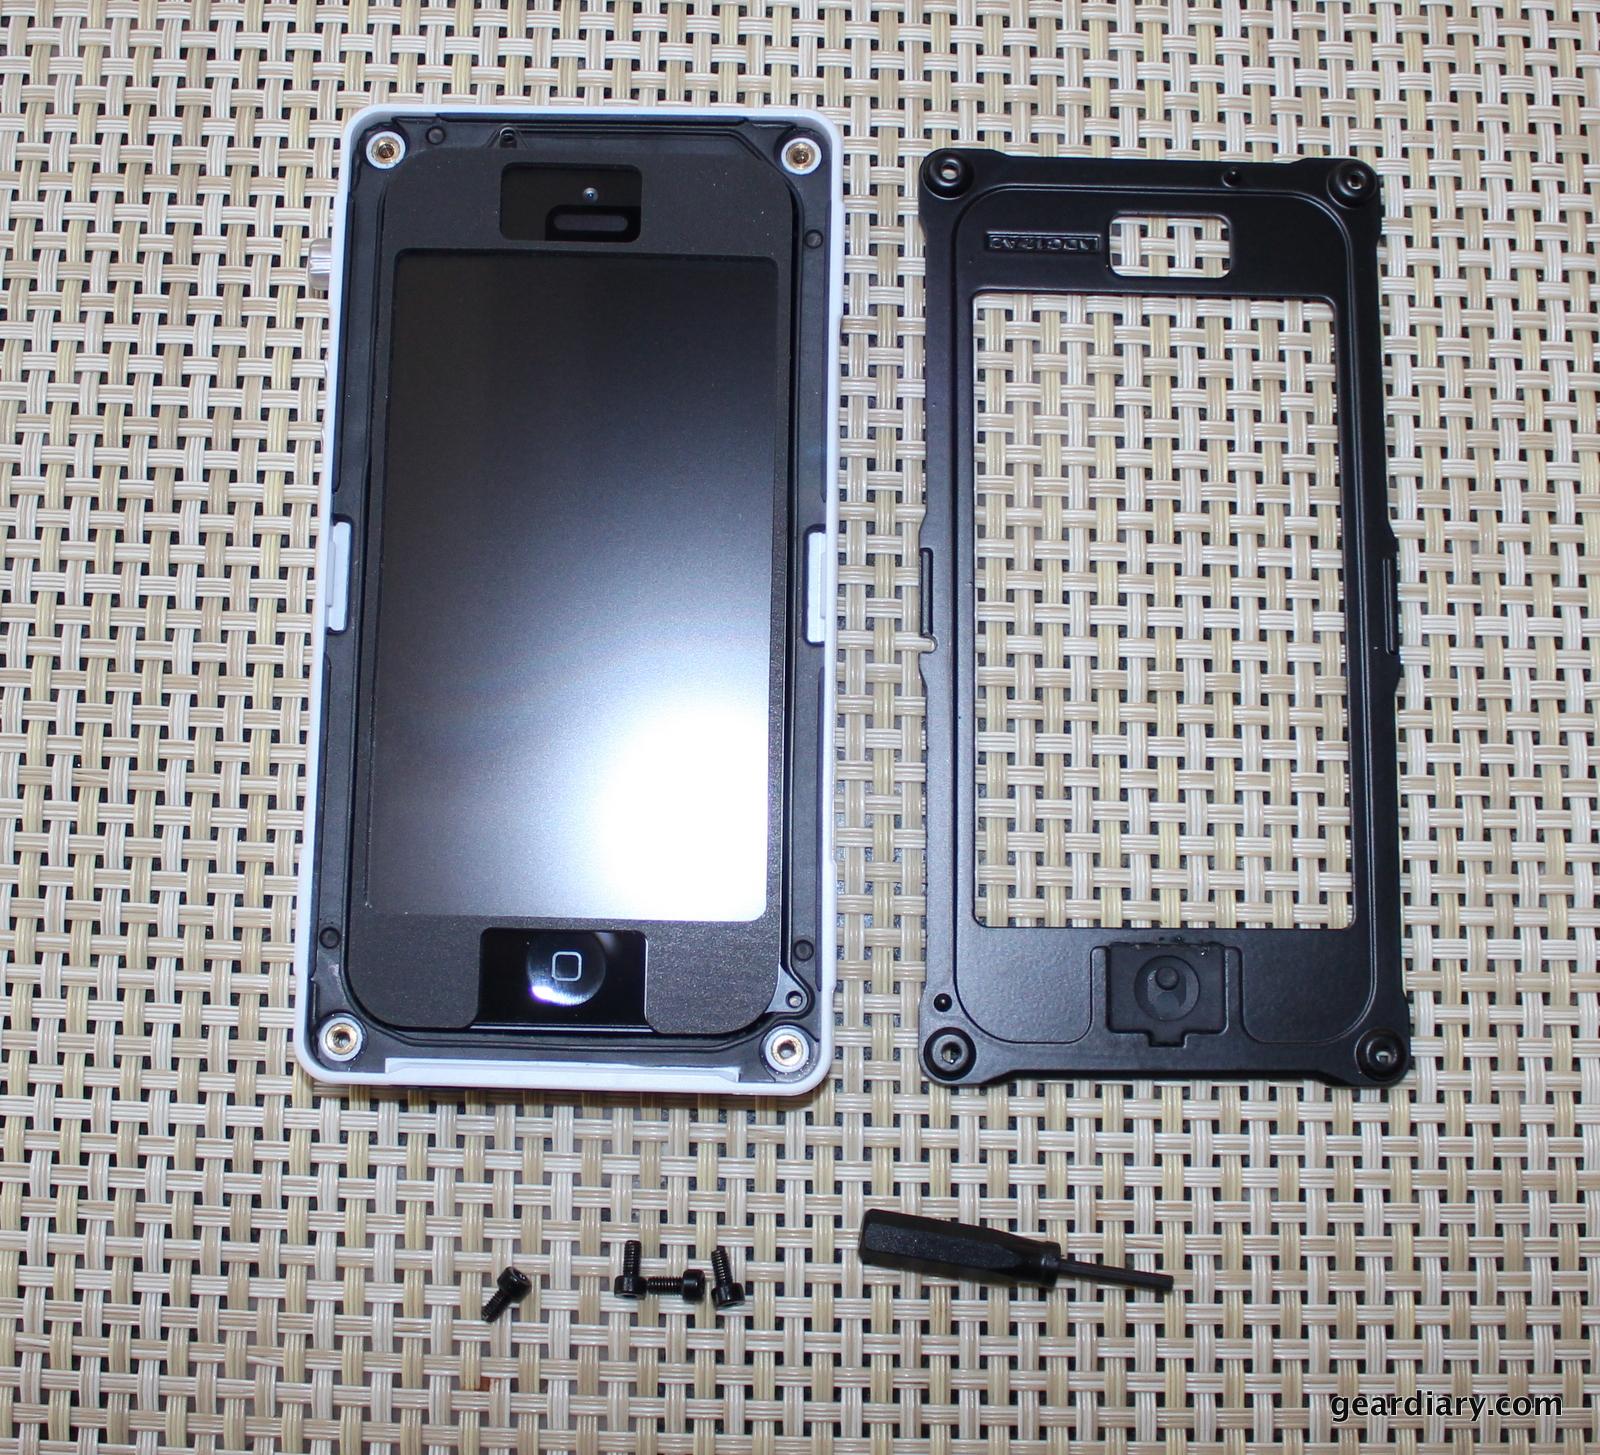 buy online 2ff74 aee48 Pelican ProGear Vault Series iPhone 5 Case Review